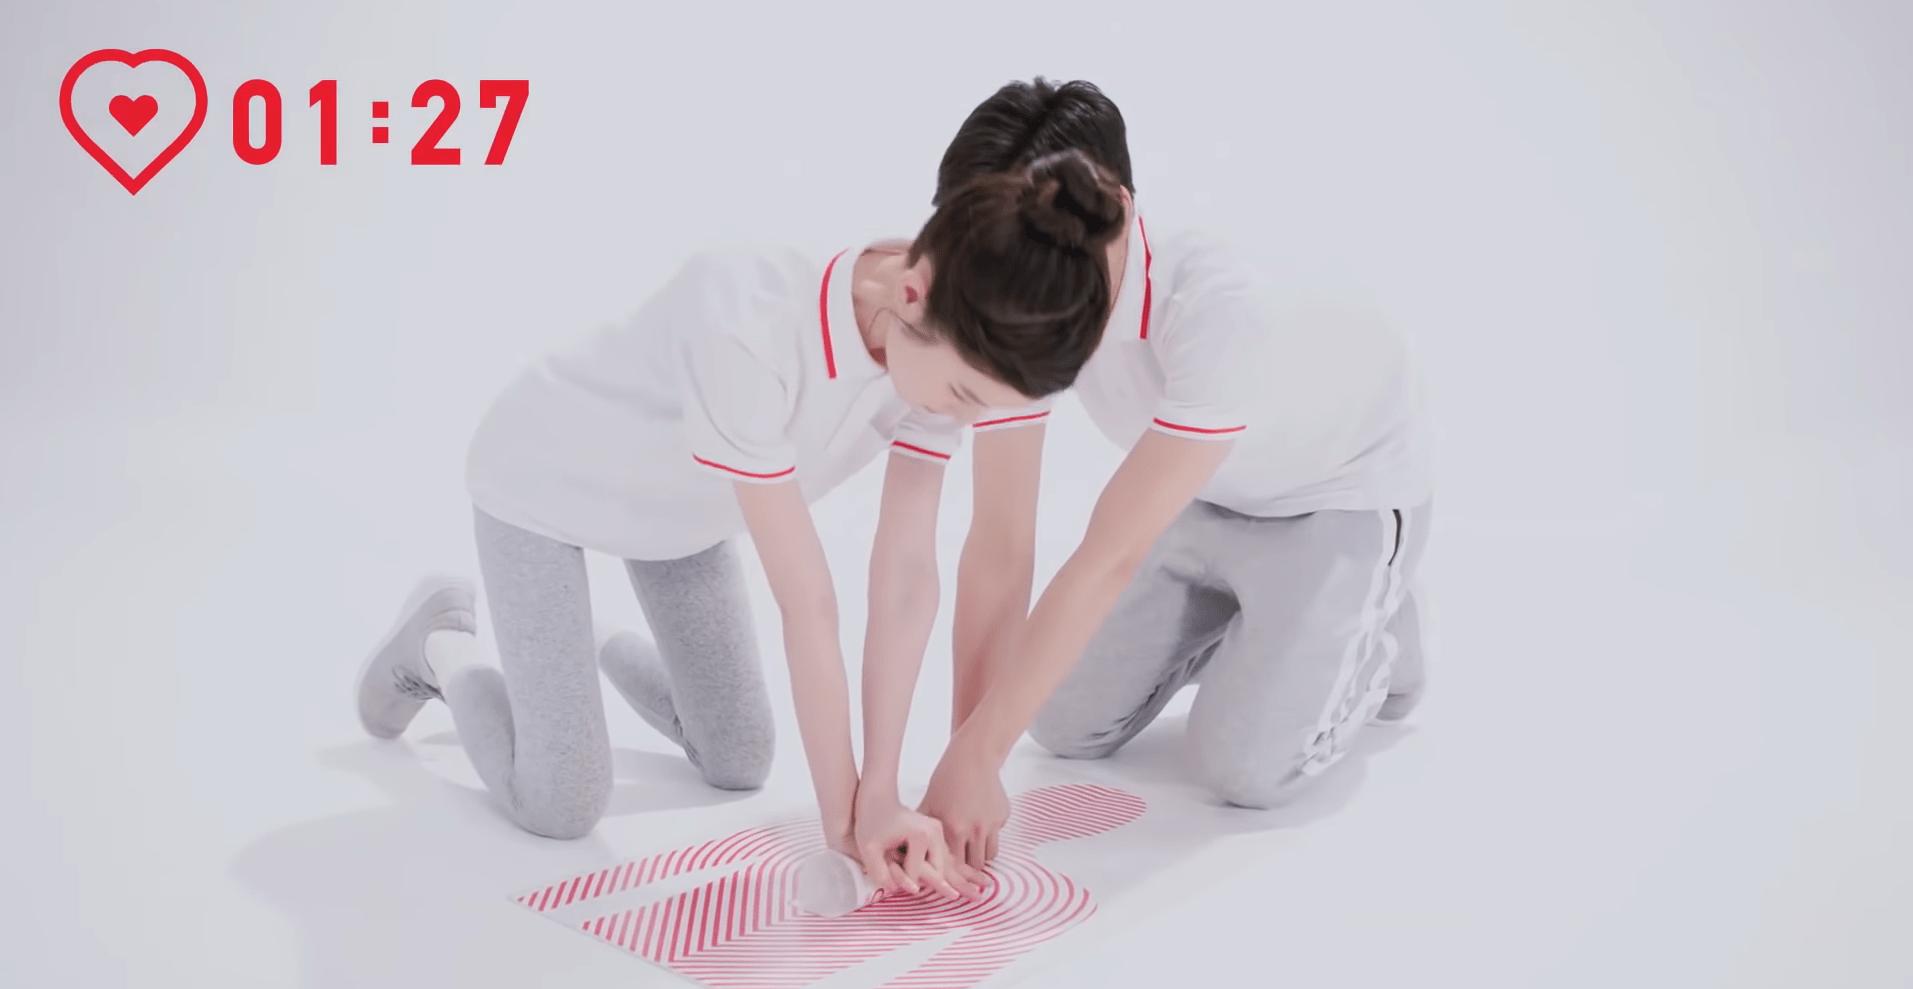 CPR TRAINING BOTTLE  心臓マッサージ